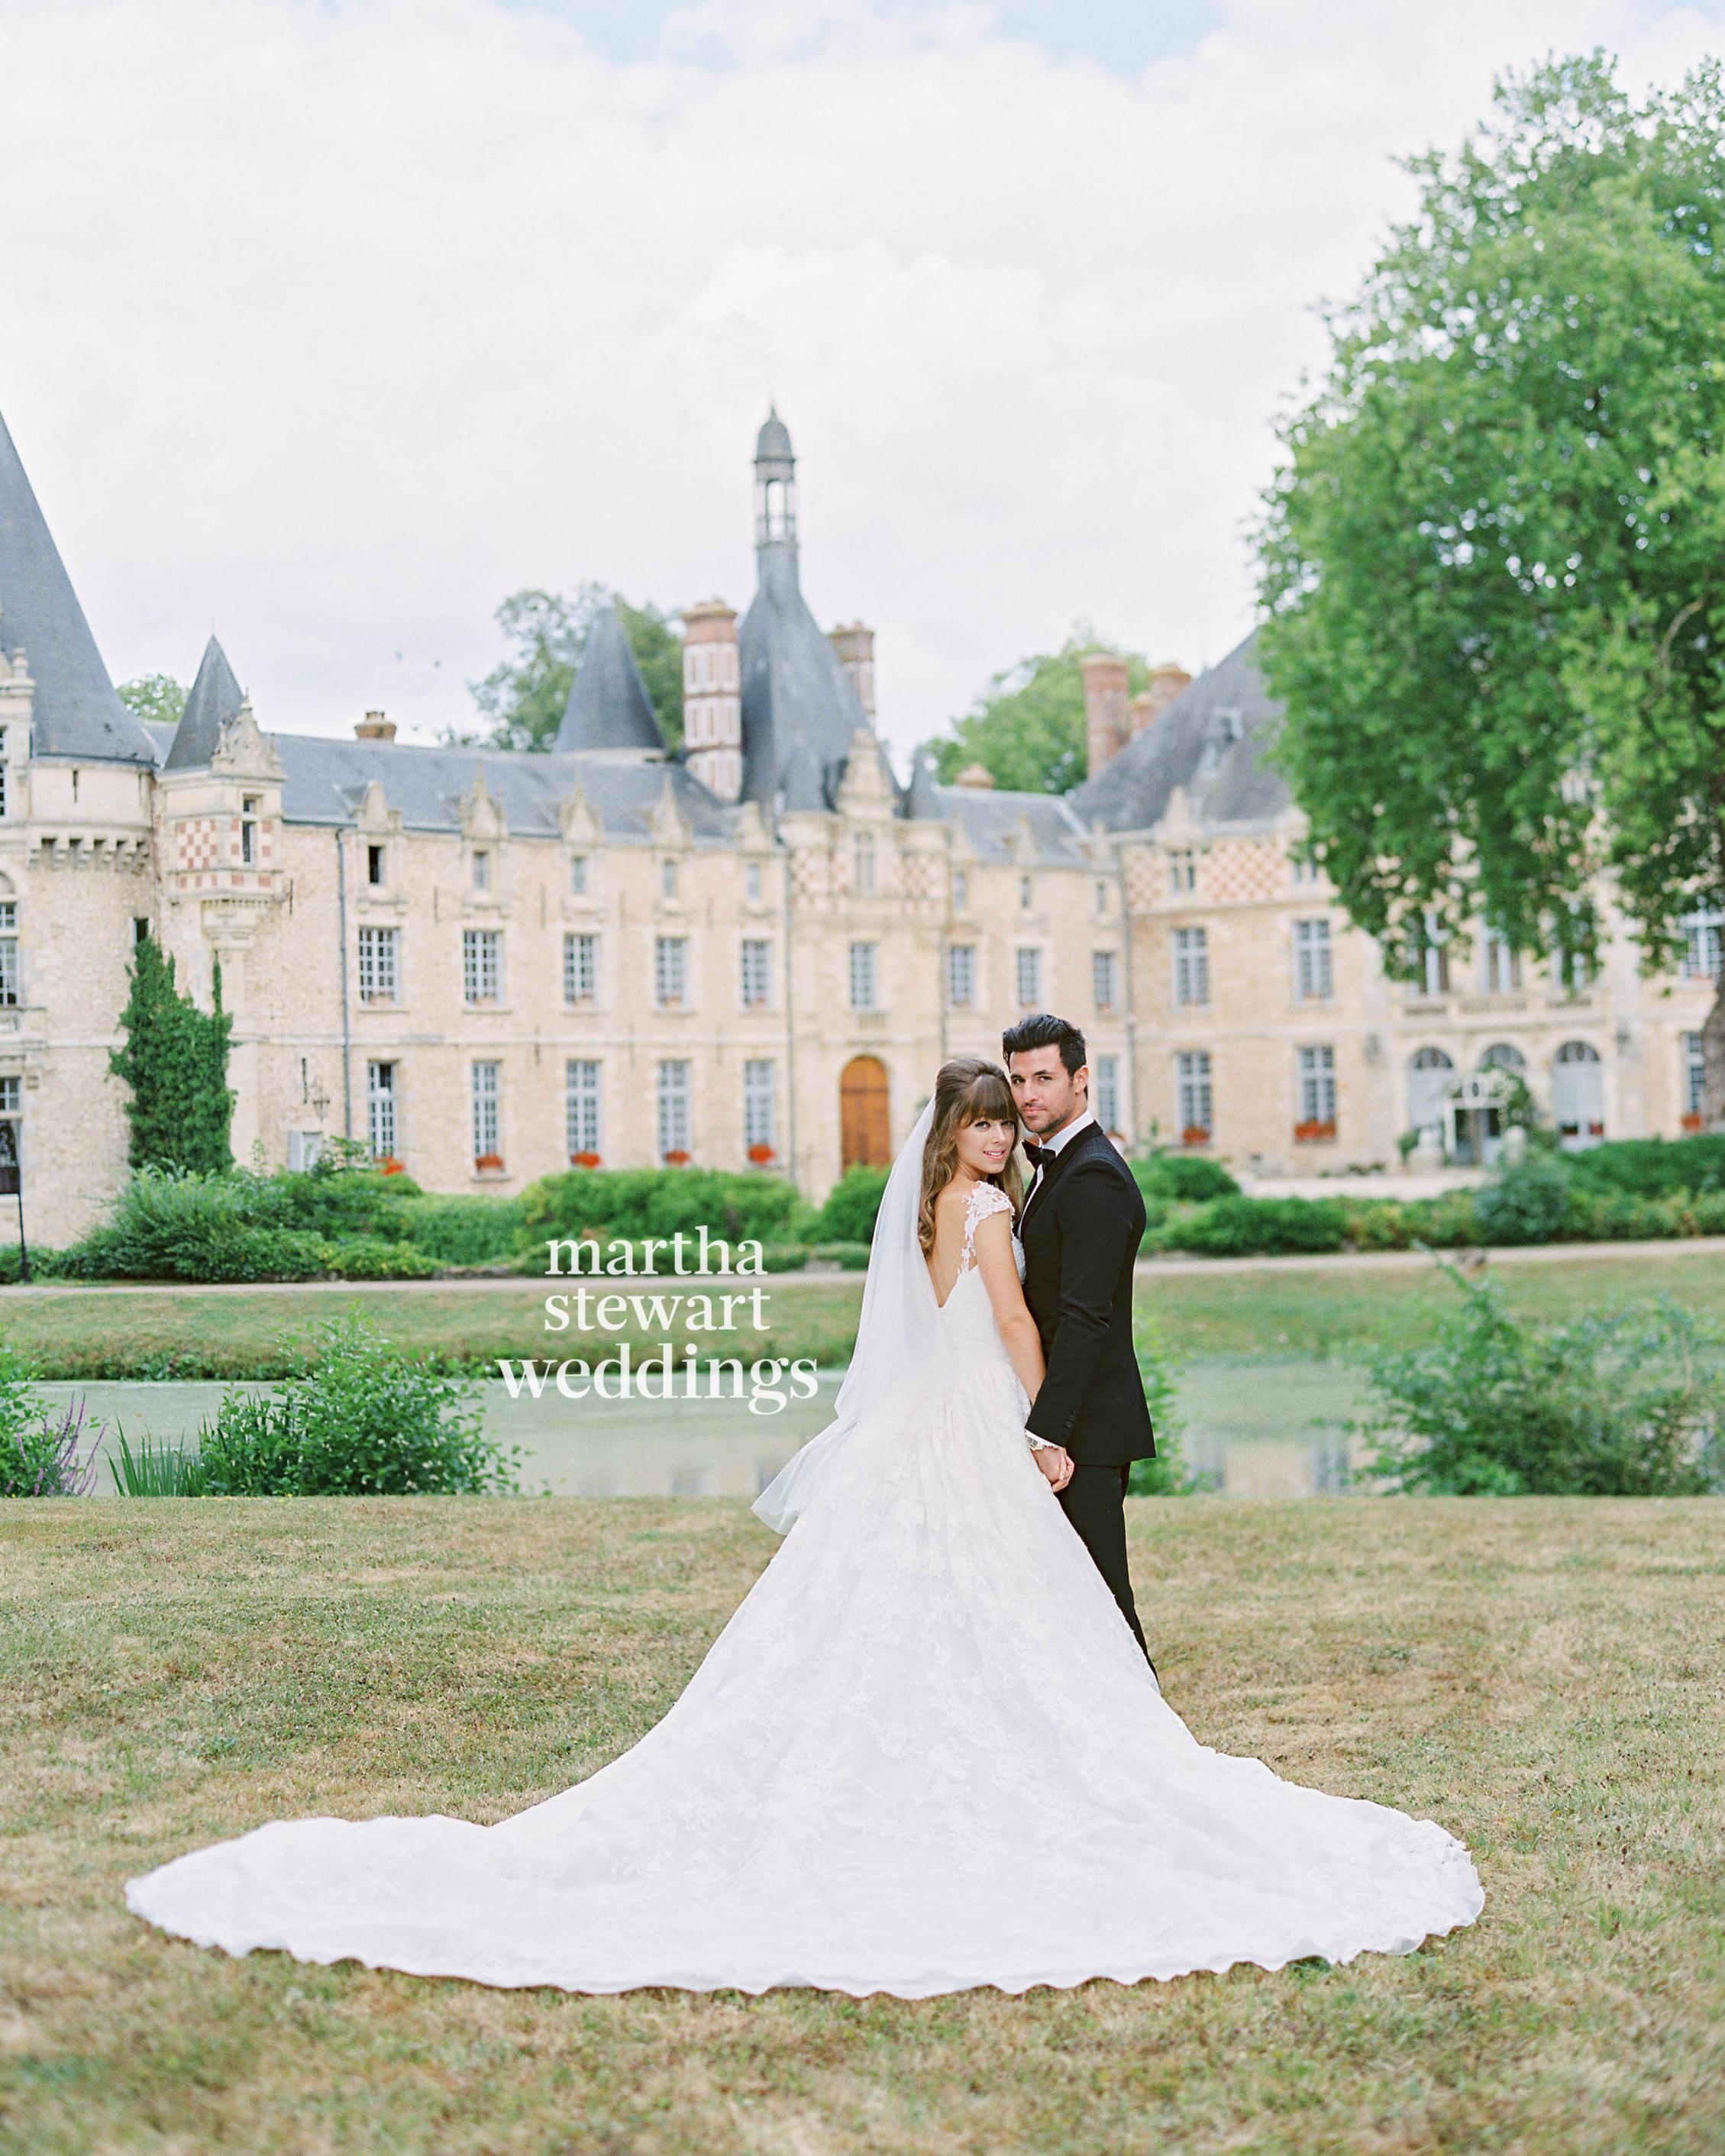 jenny-freddie-wedding-france-430-d112242-watermarked-1215.jpg